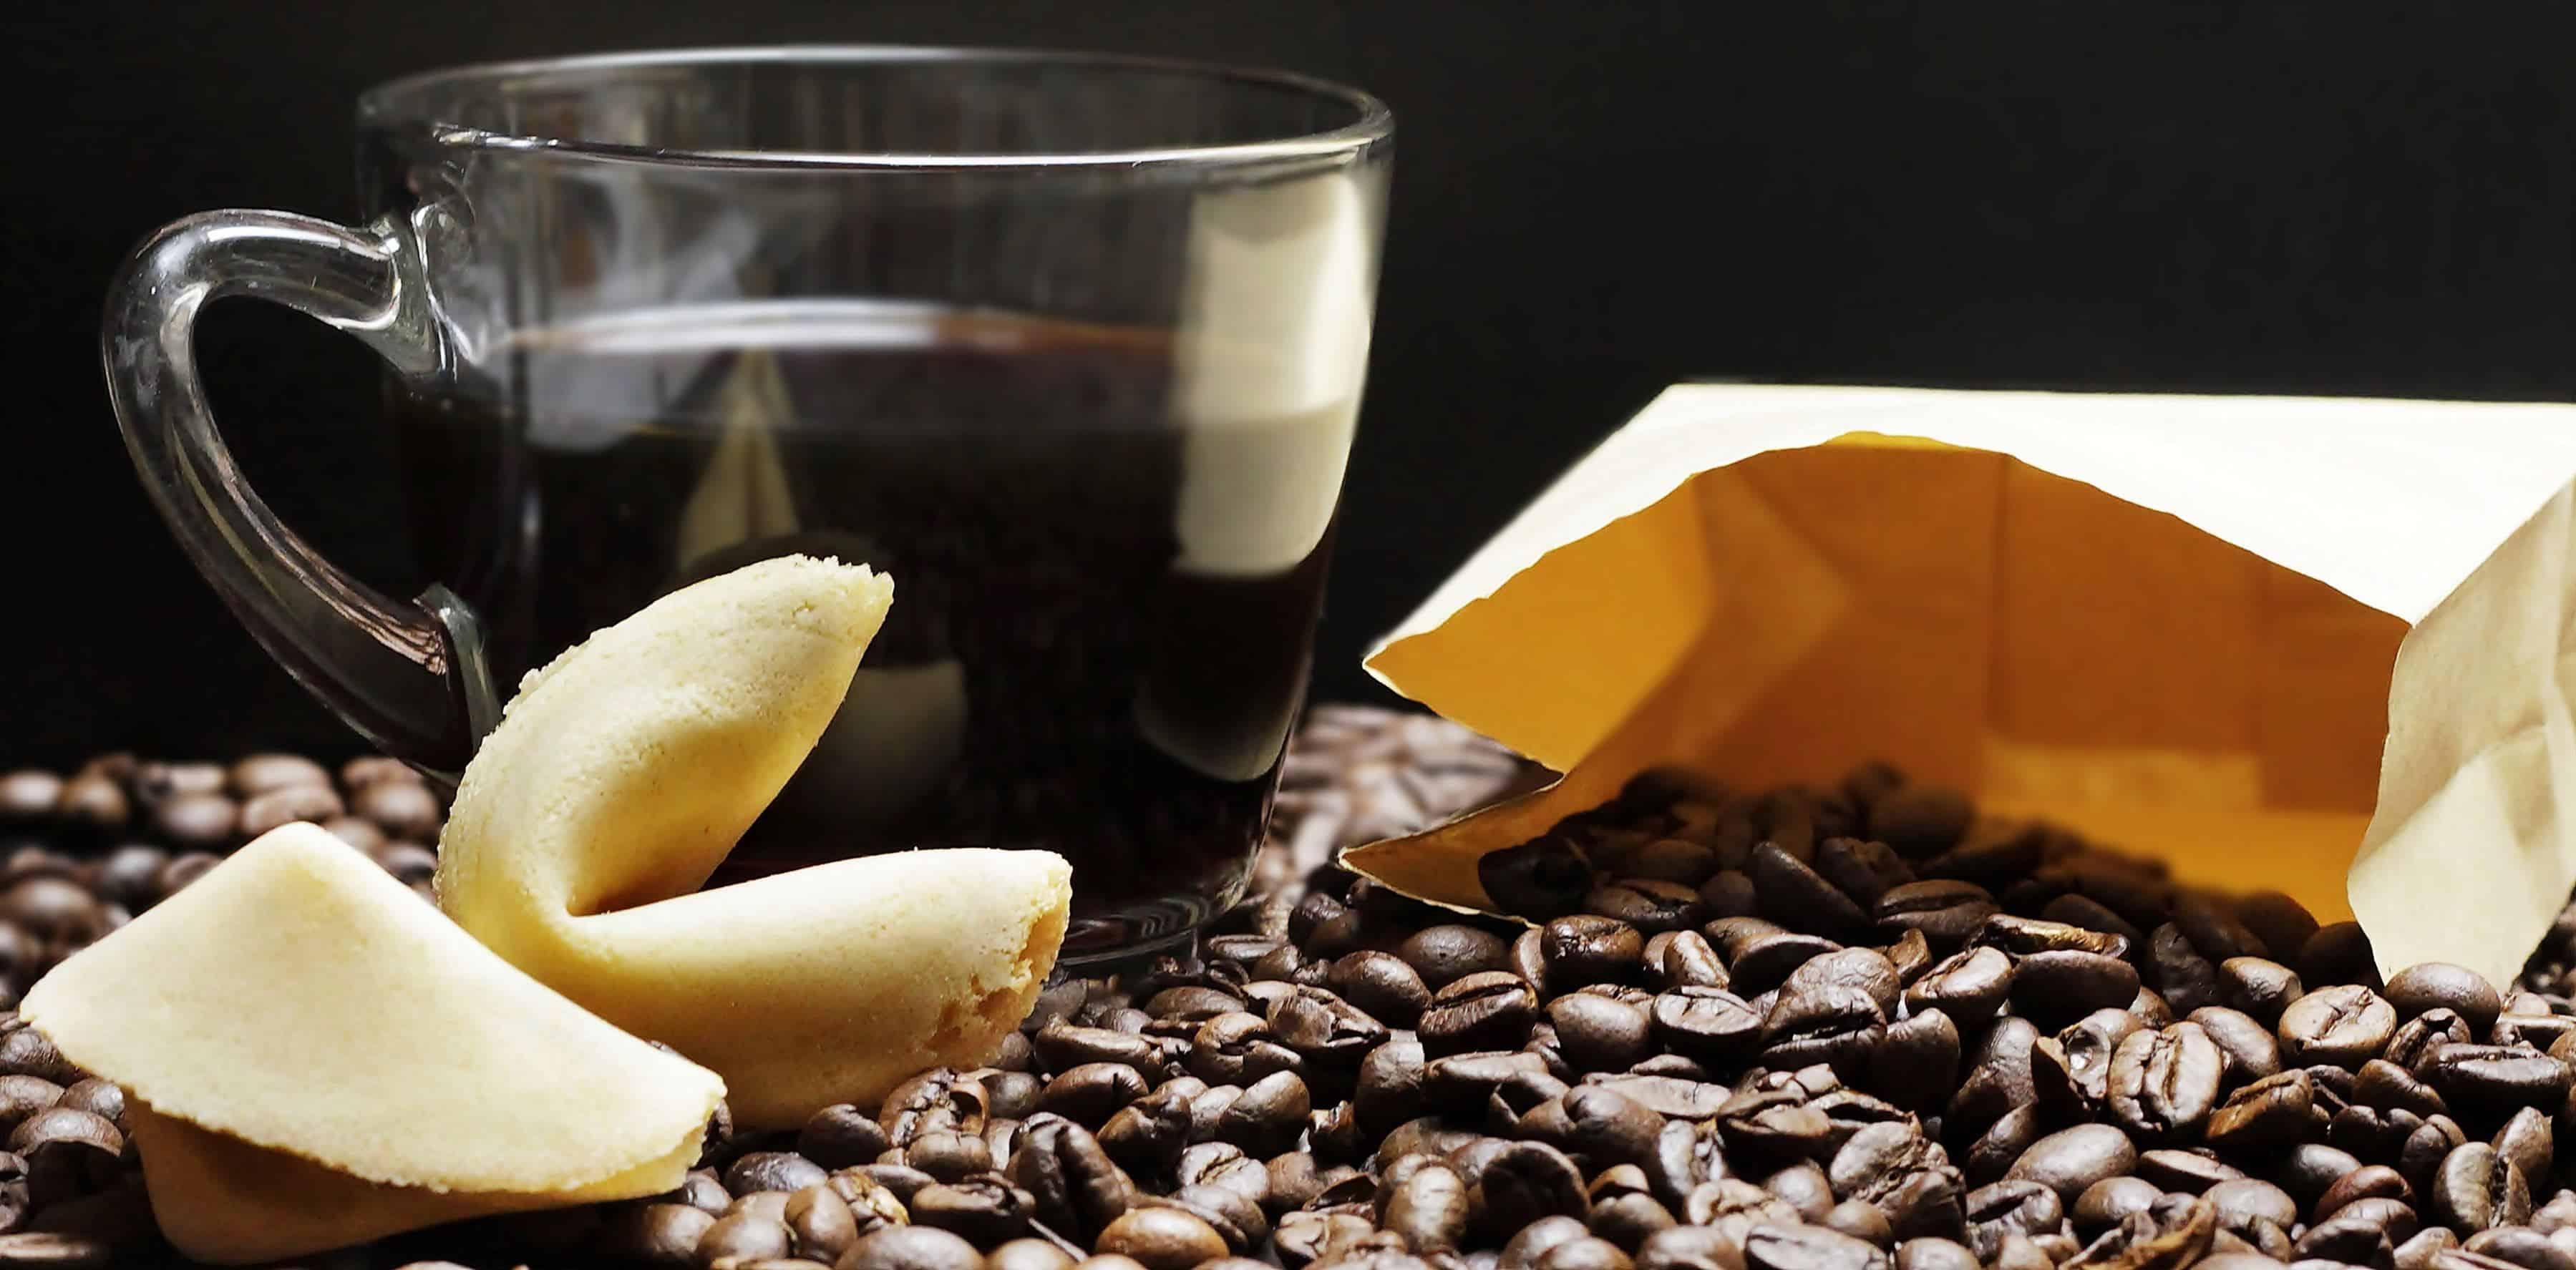 free picture  coffee mug  drink  food  espresso  beverage